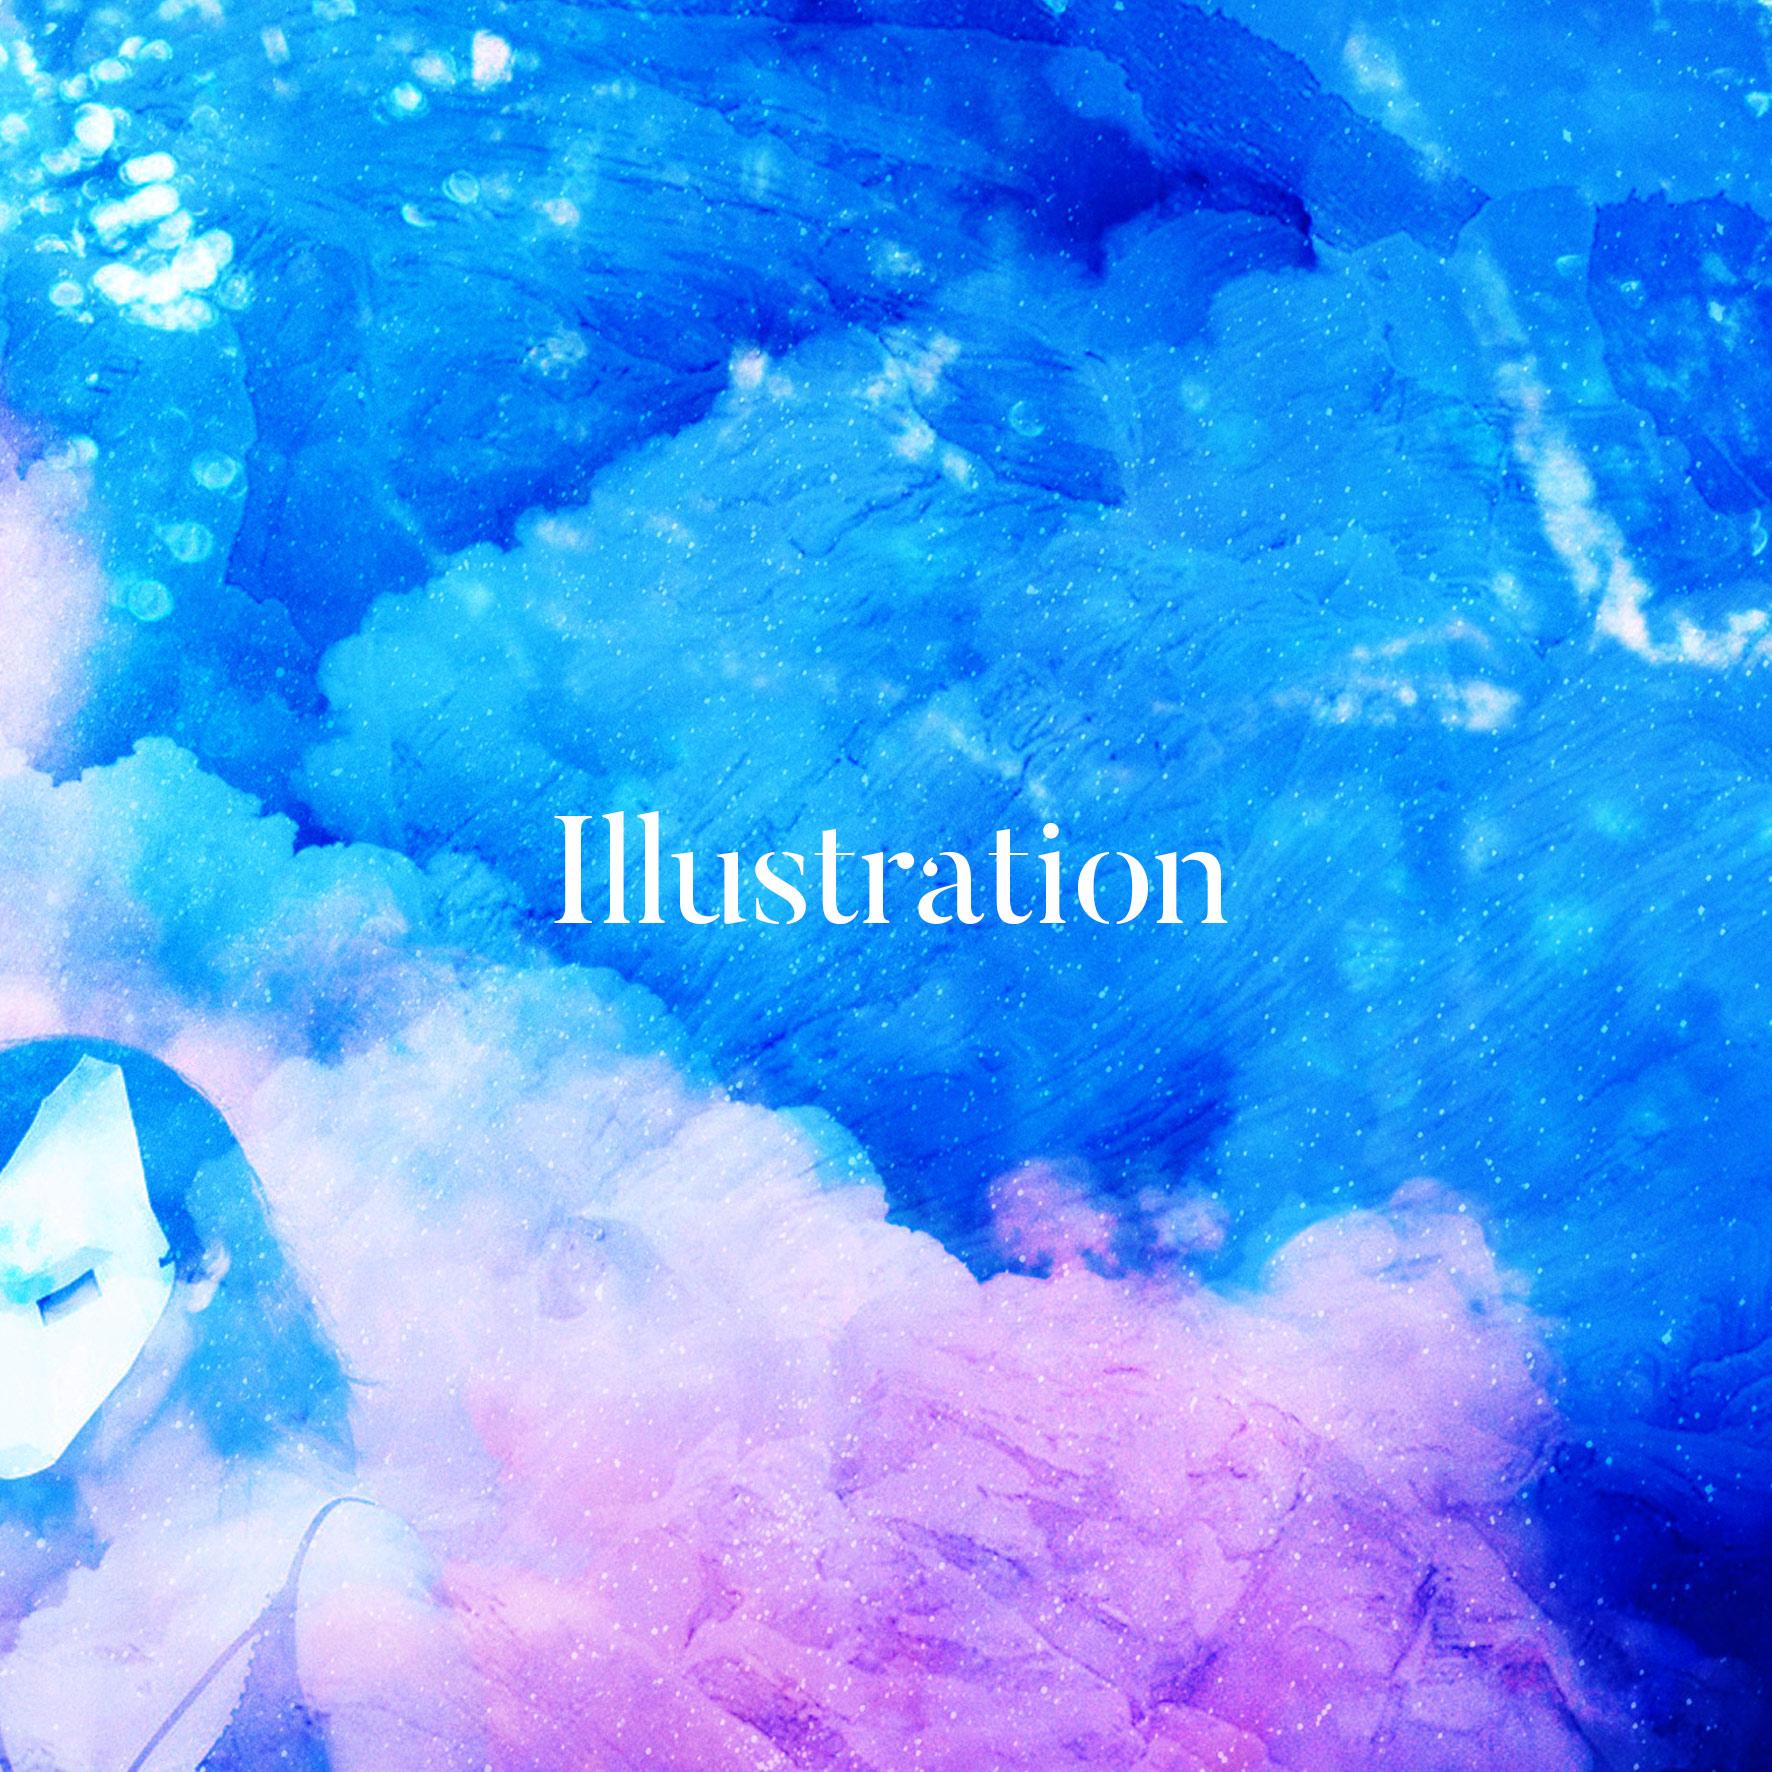 illustration-agence-ysee